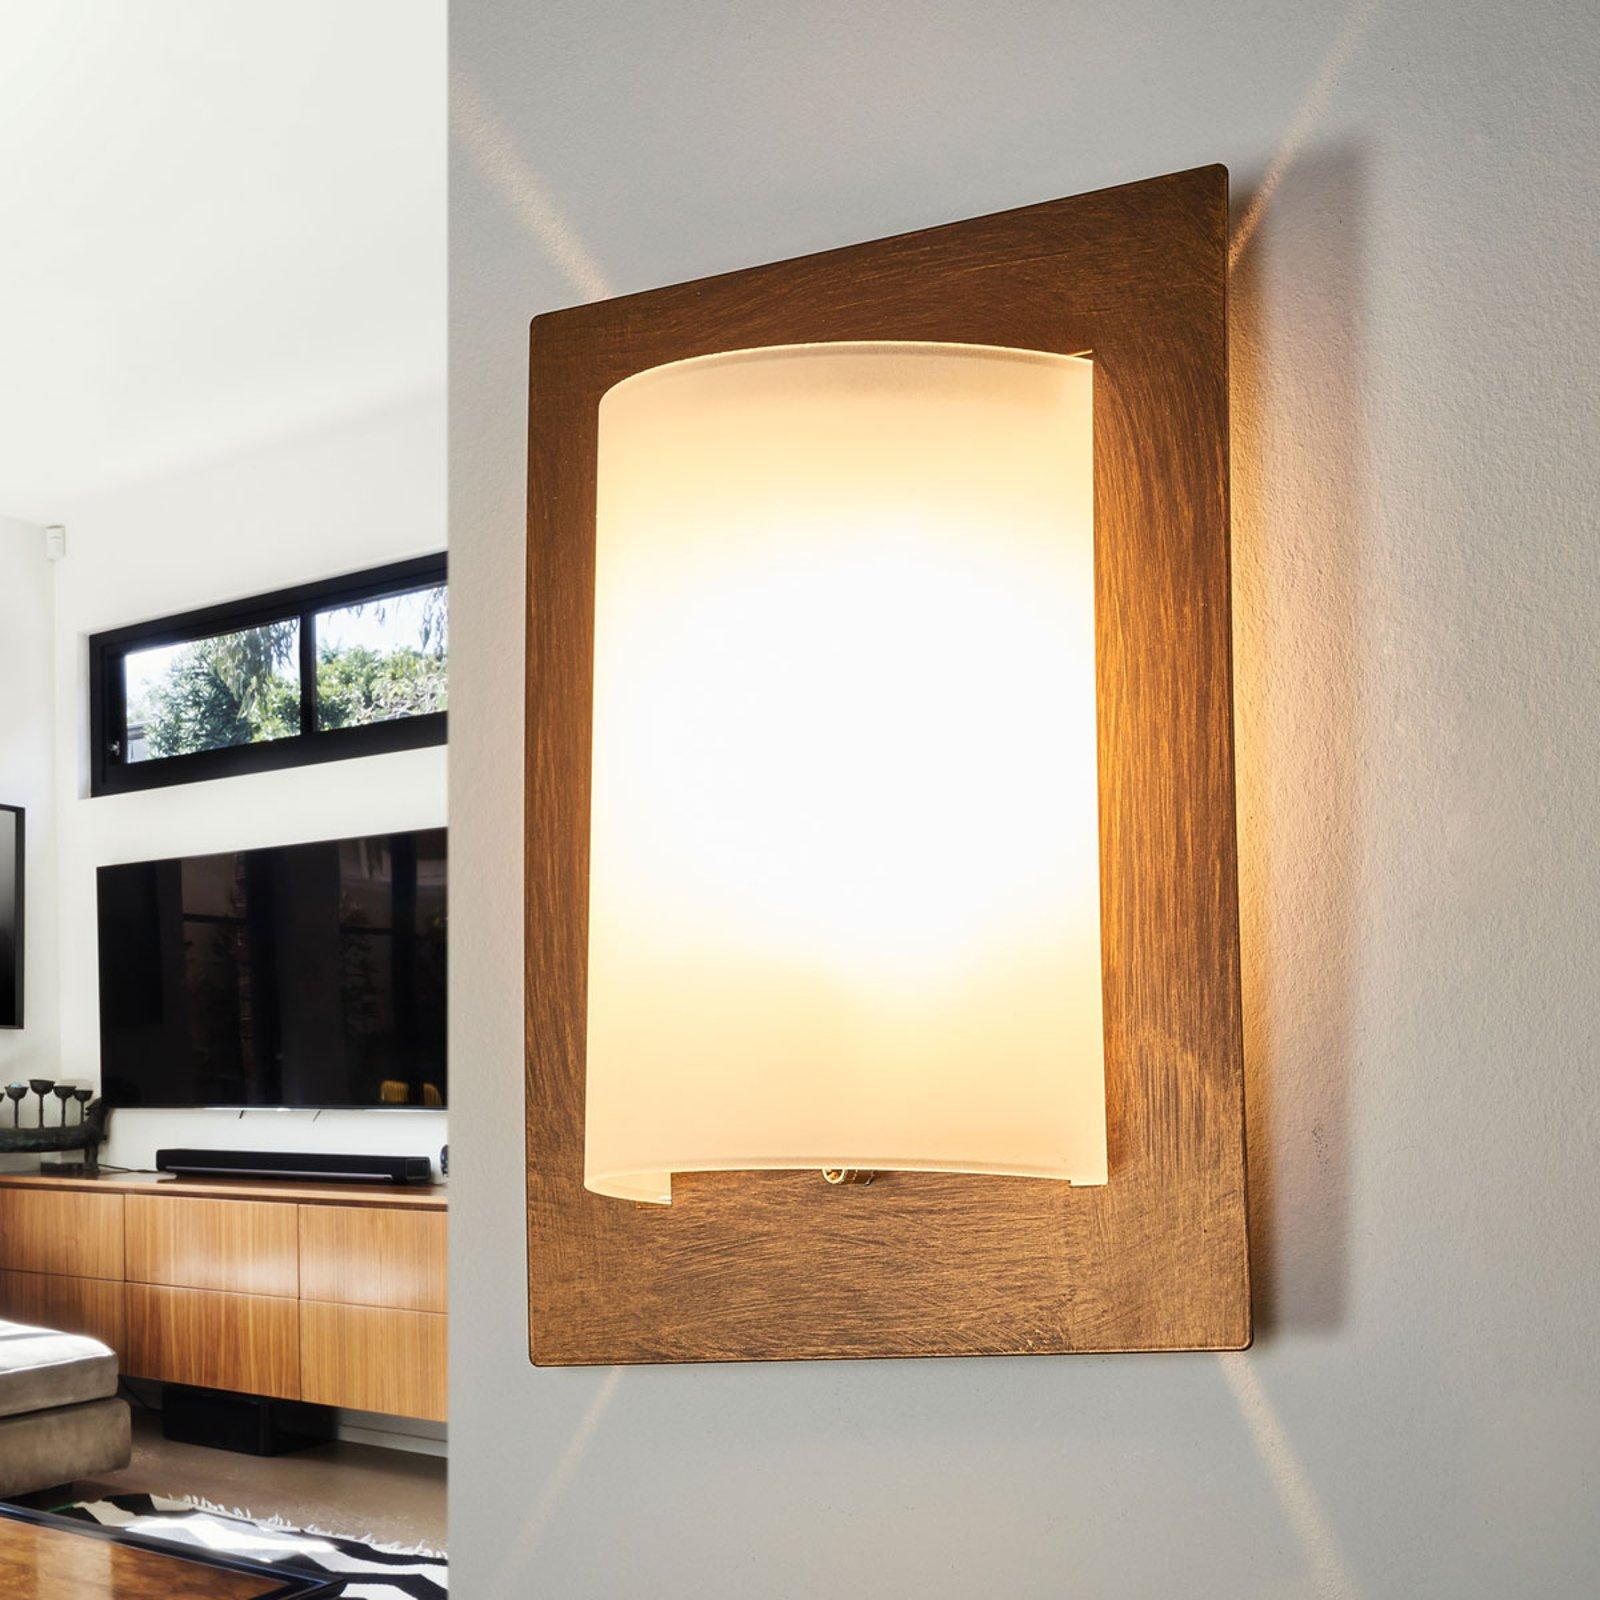 Vegglampe Metwally, rust, 28 x 23 cm